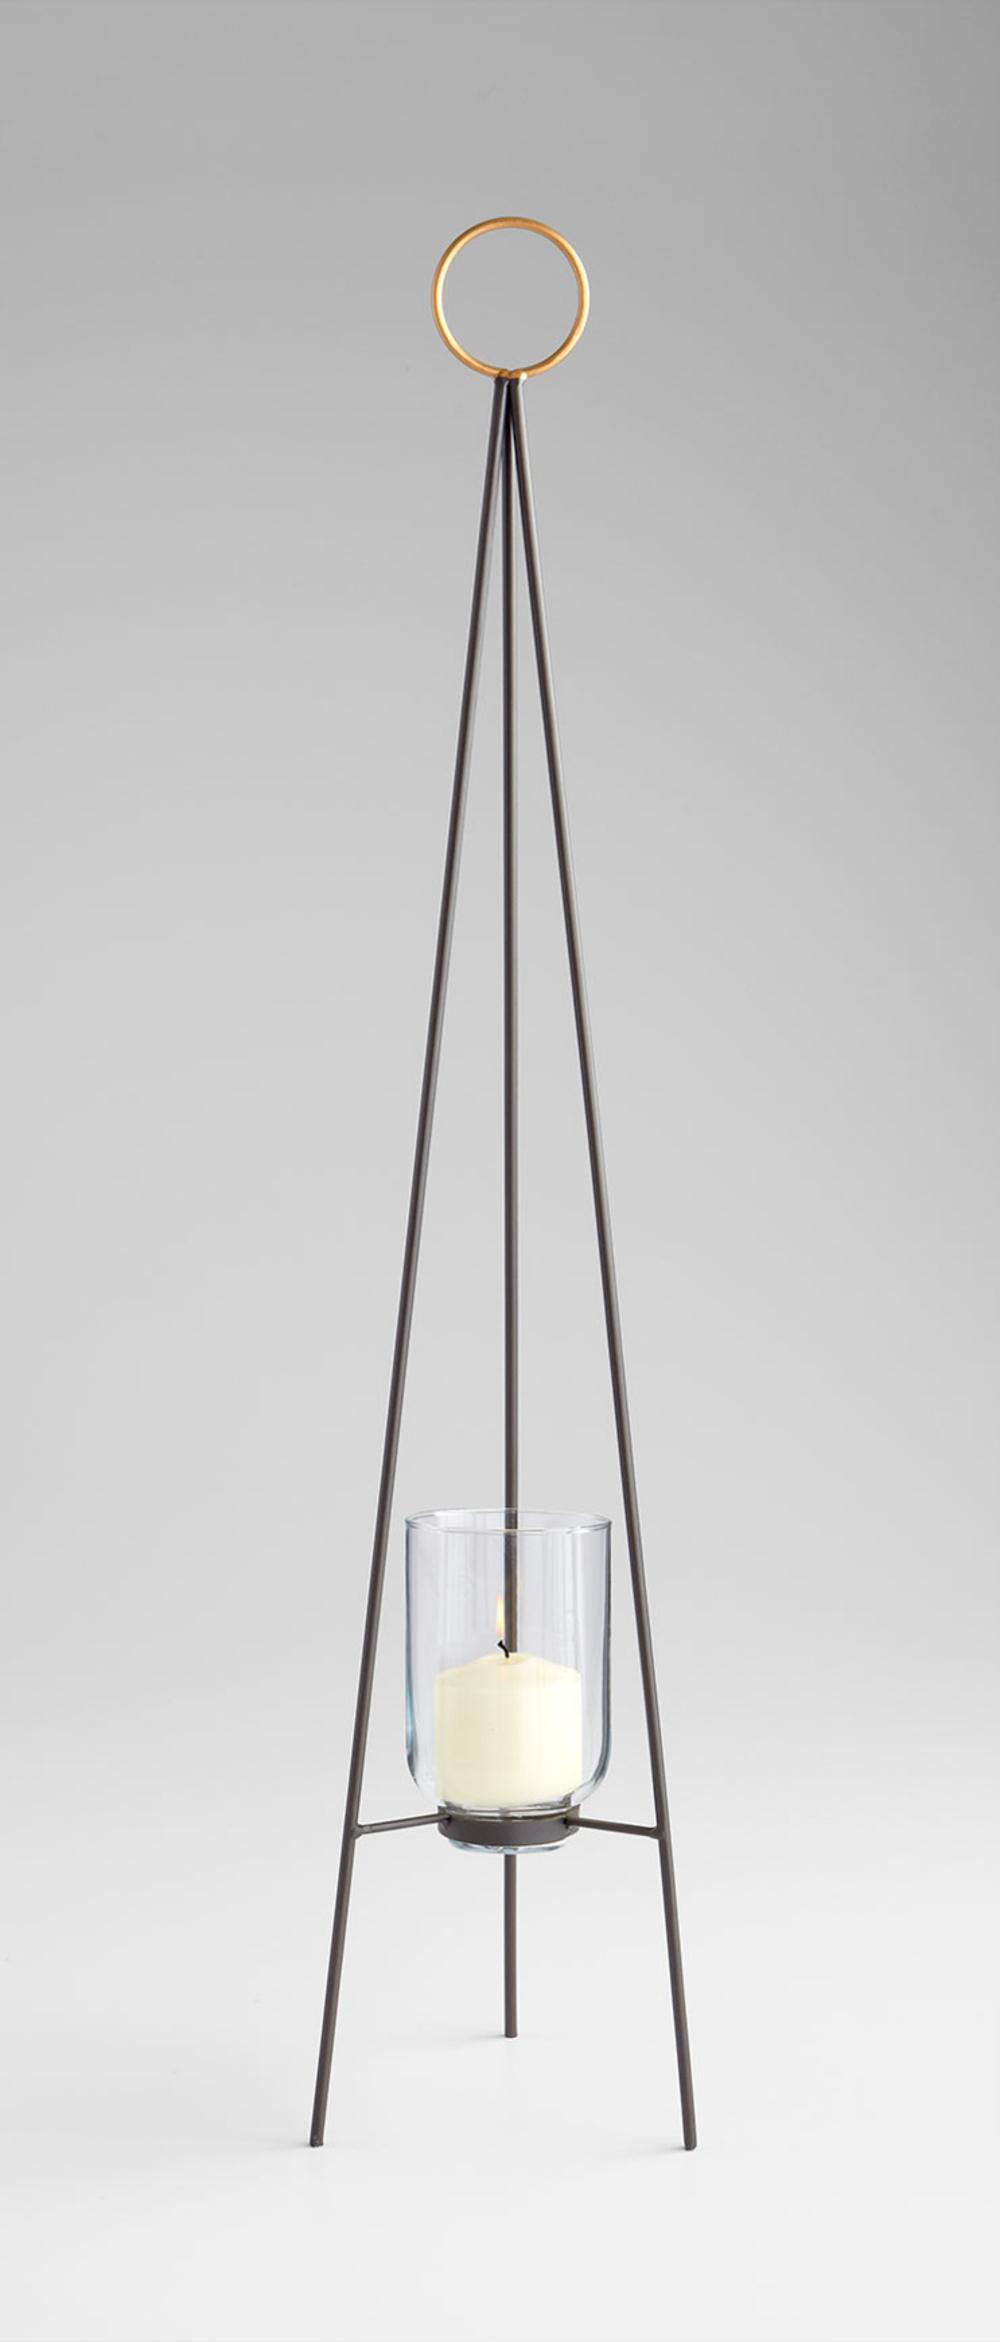 Cyan Designs - Medium Tripod Ring Candleholder